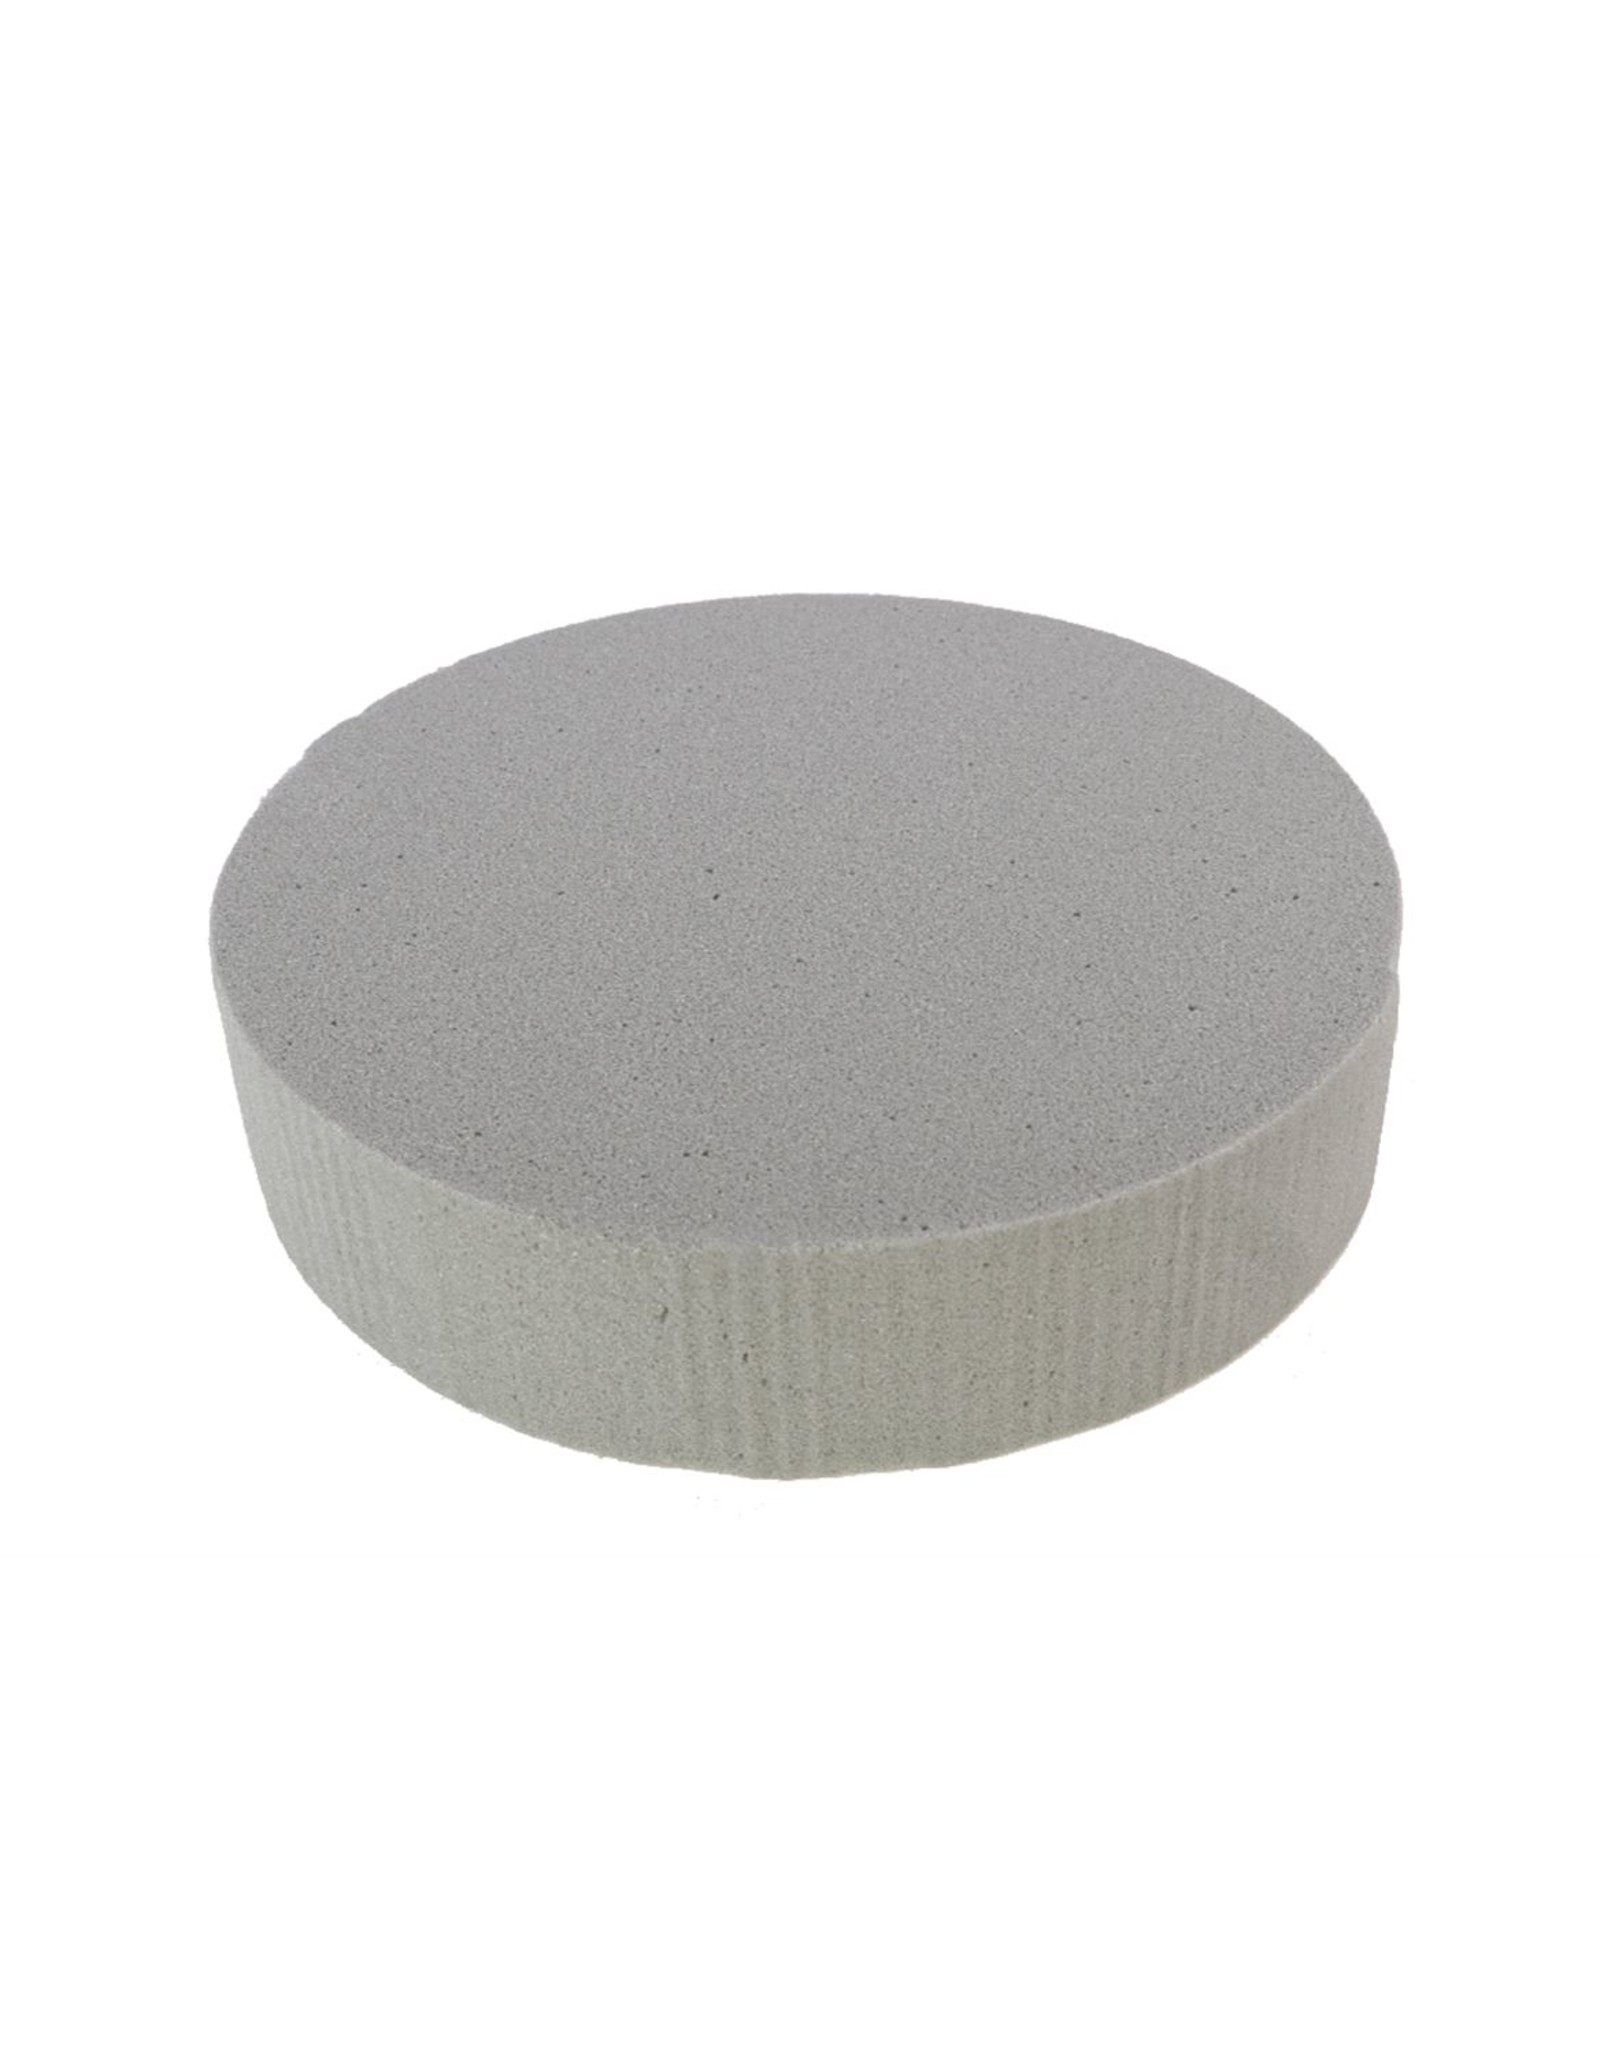 HD Basic Cake Dry Sld Foam D30.0h7.0 x 8